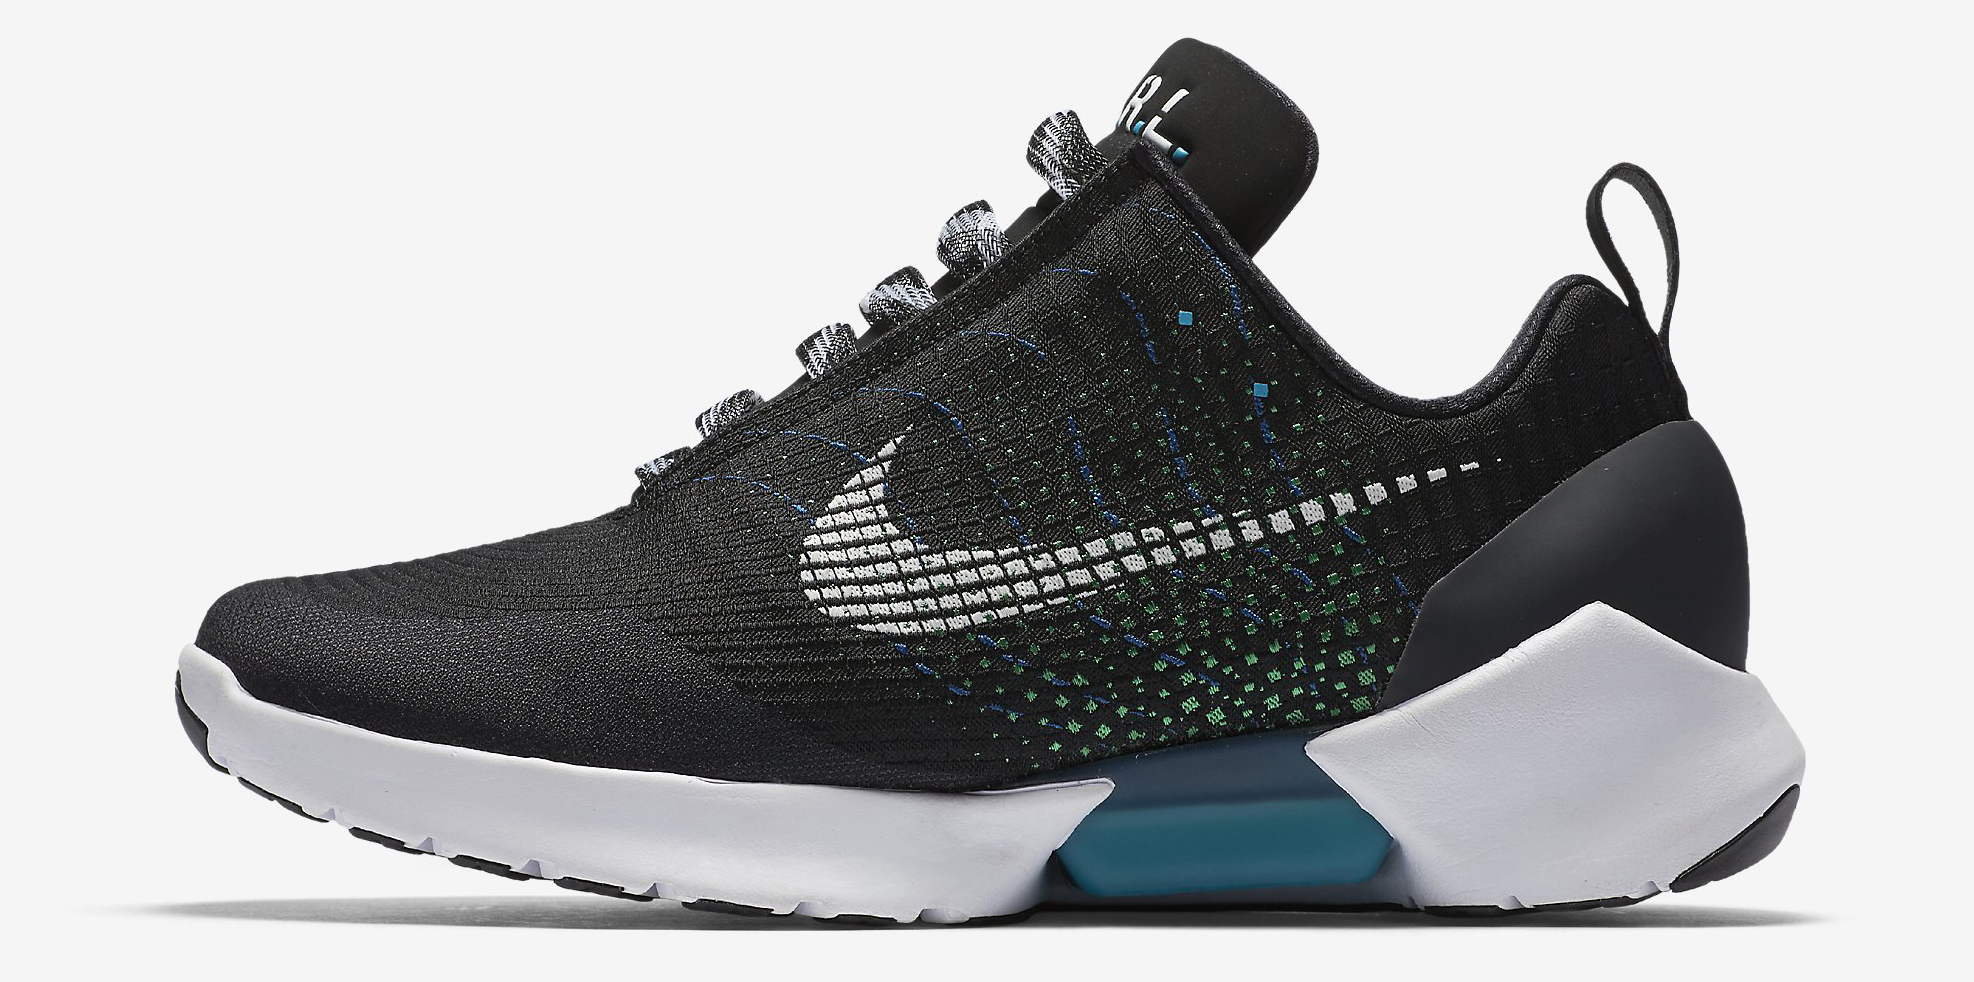 Nike Hyperadapt 843871-001 Profile